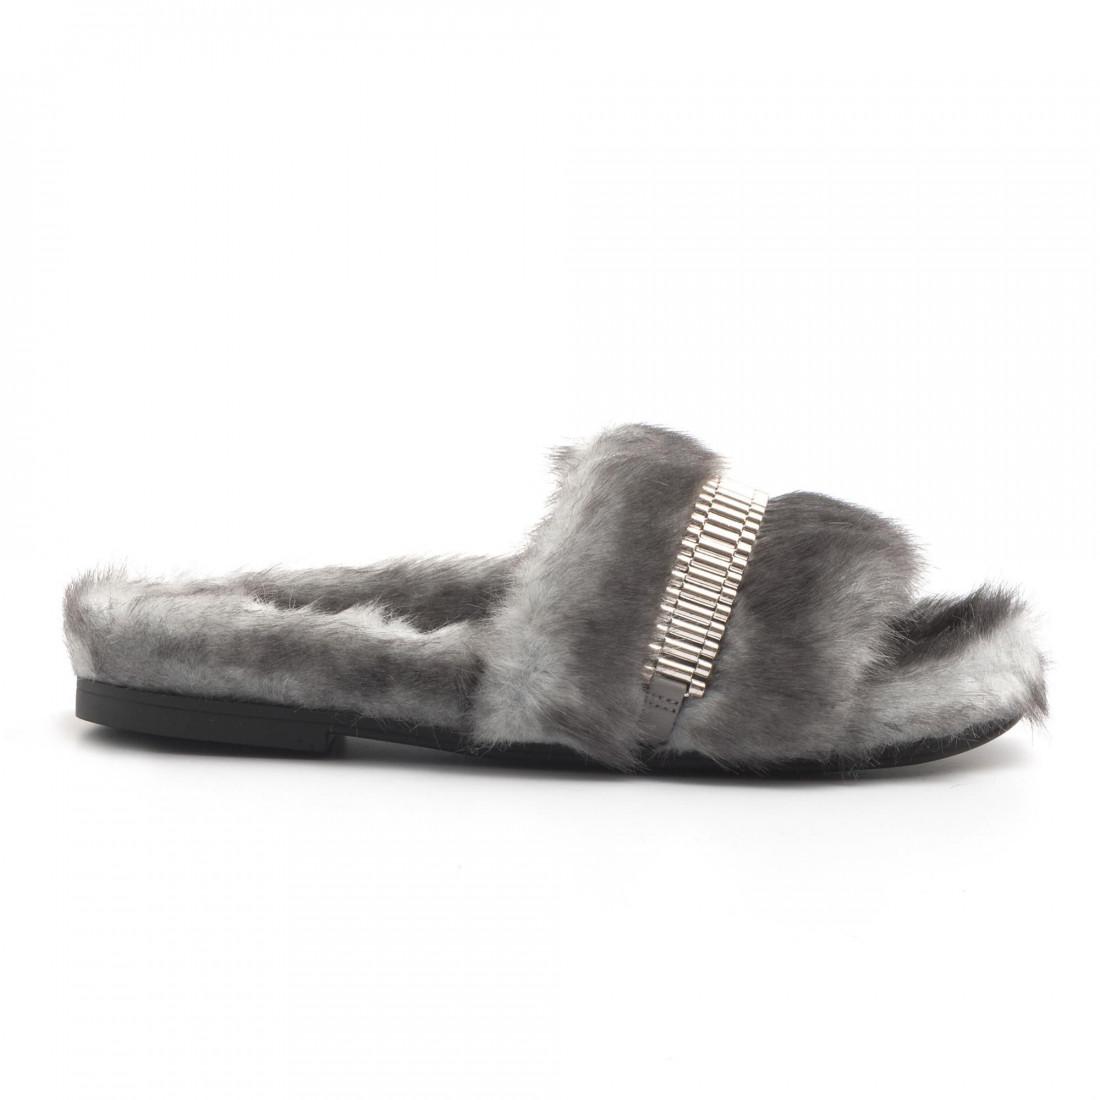 sandals woman kendall kylie shadegrey 3046